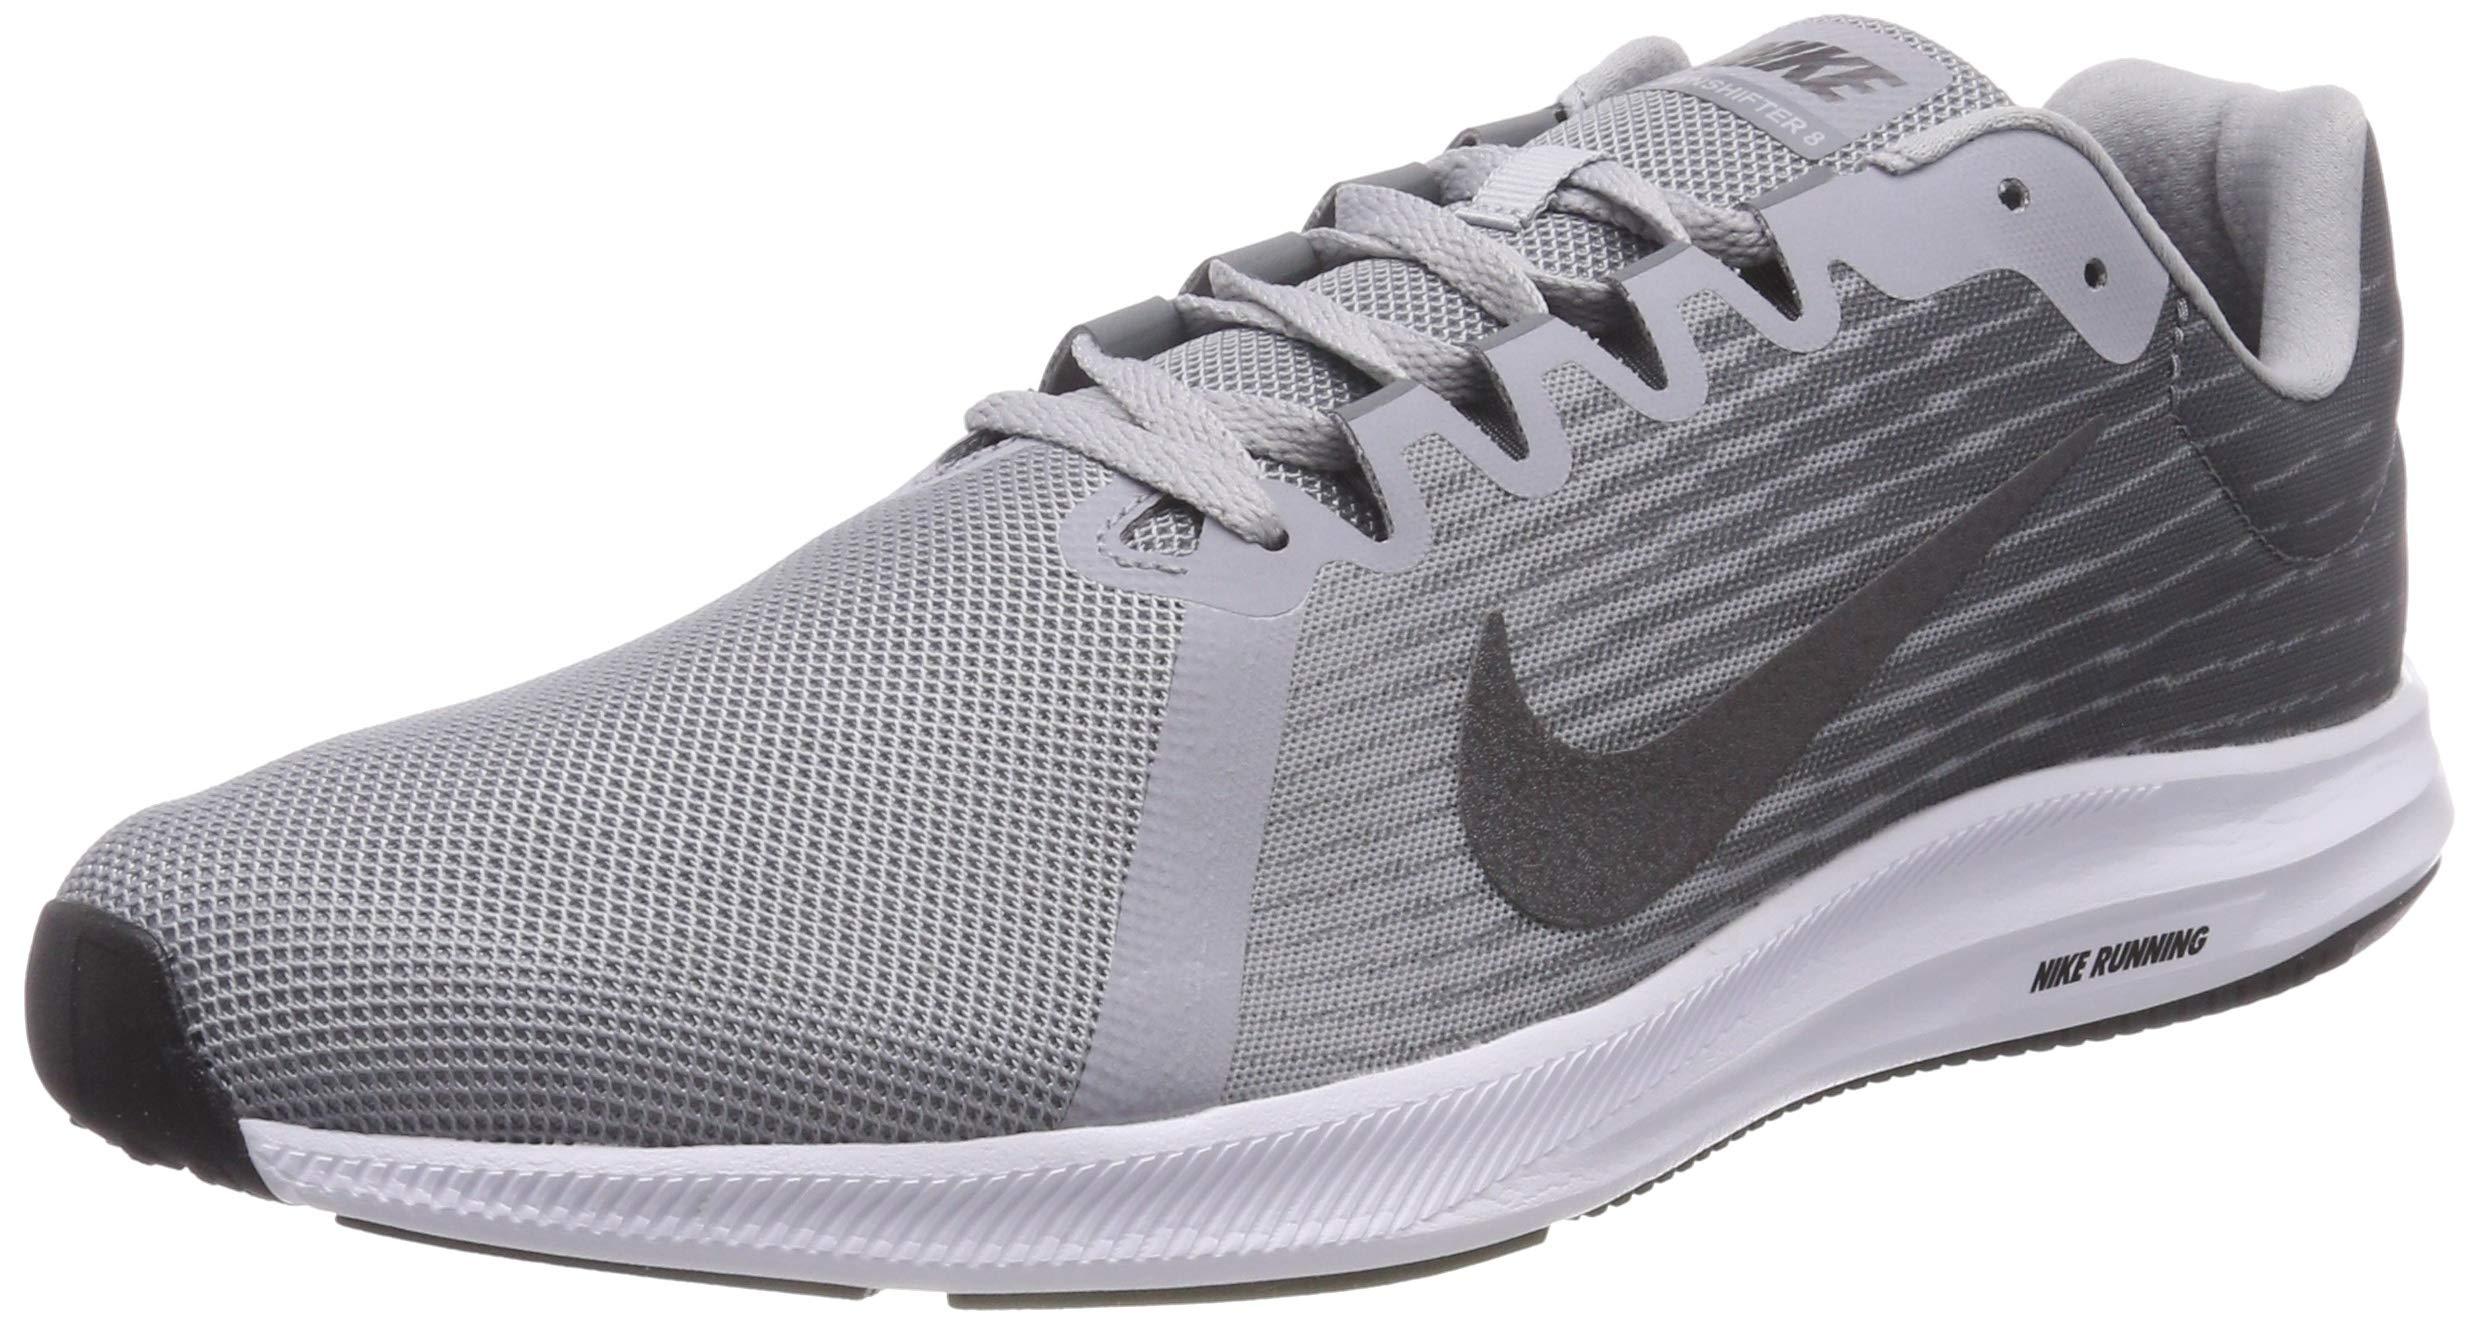 HommeLoup Foncé Métallique Froid Downshifter gris Eu De Nike 8Chaussures Running 00440 eDYWHb2I9E